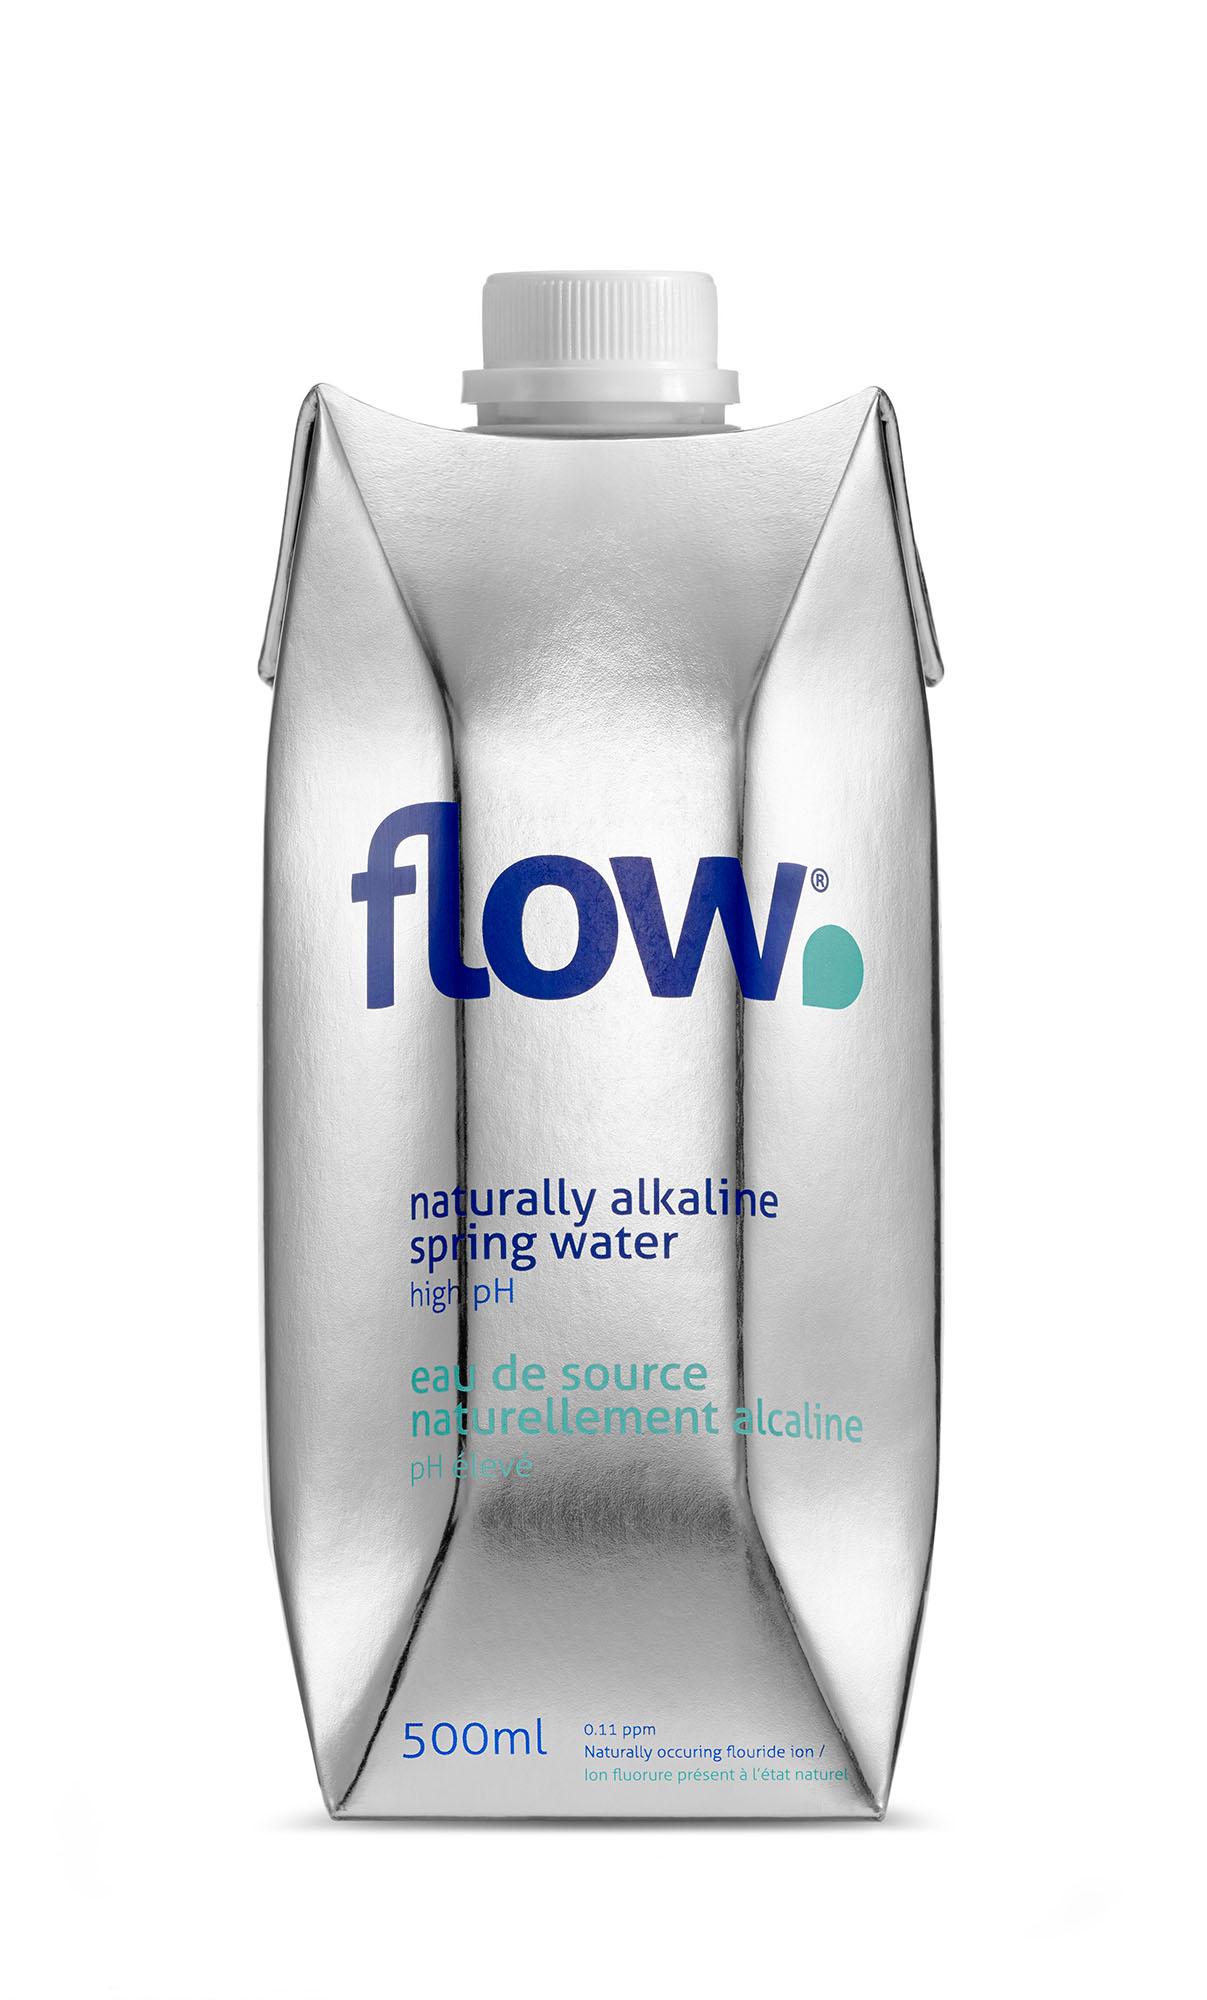 Make Alkaline Water Naturally